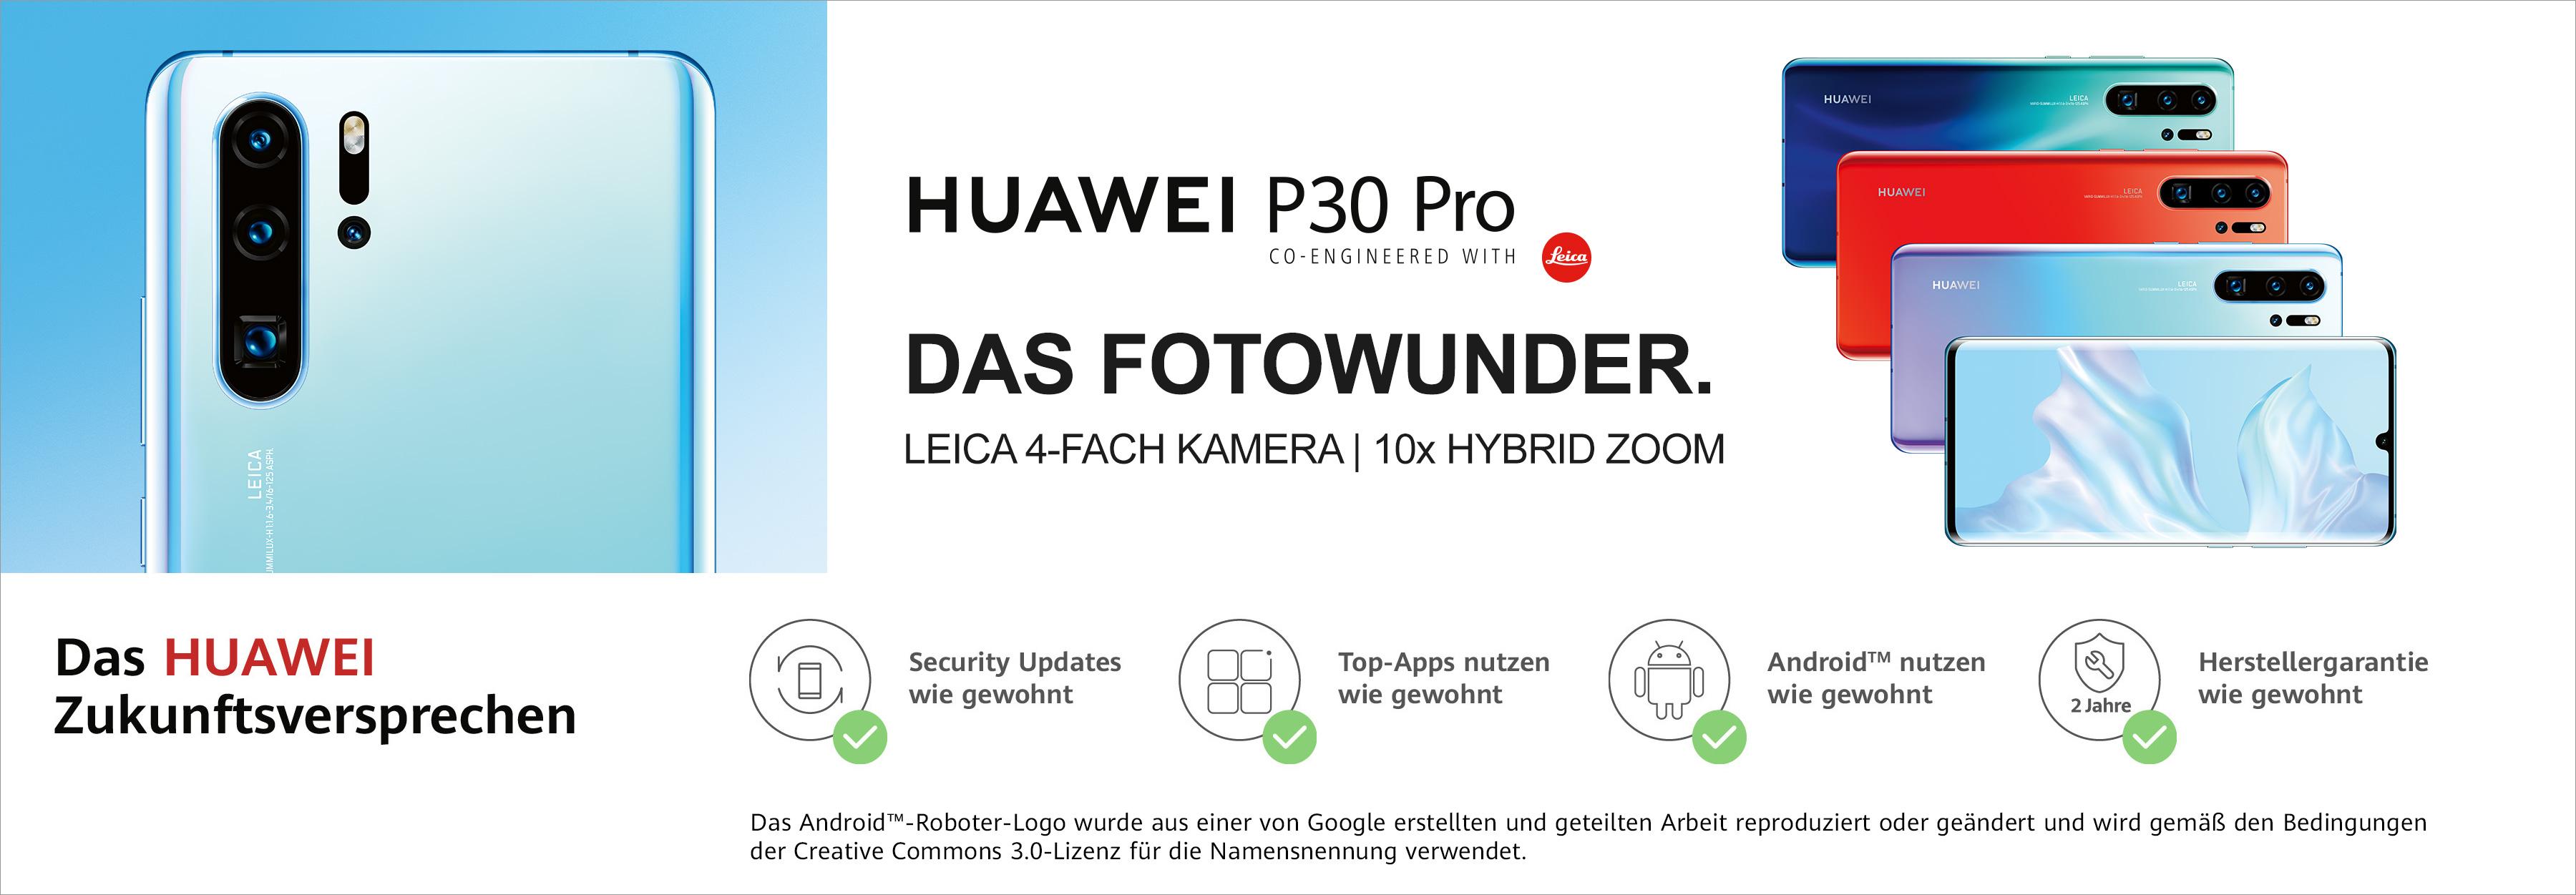 Neues Huawei P30 Pro